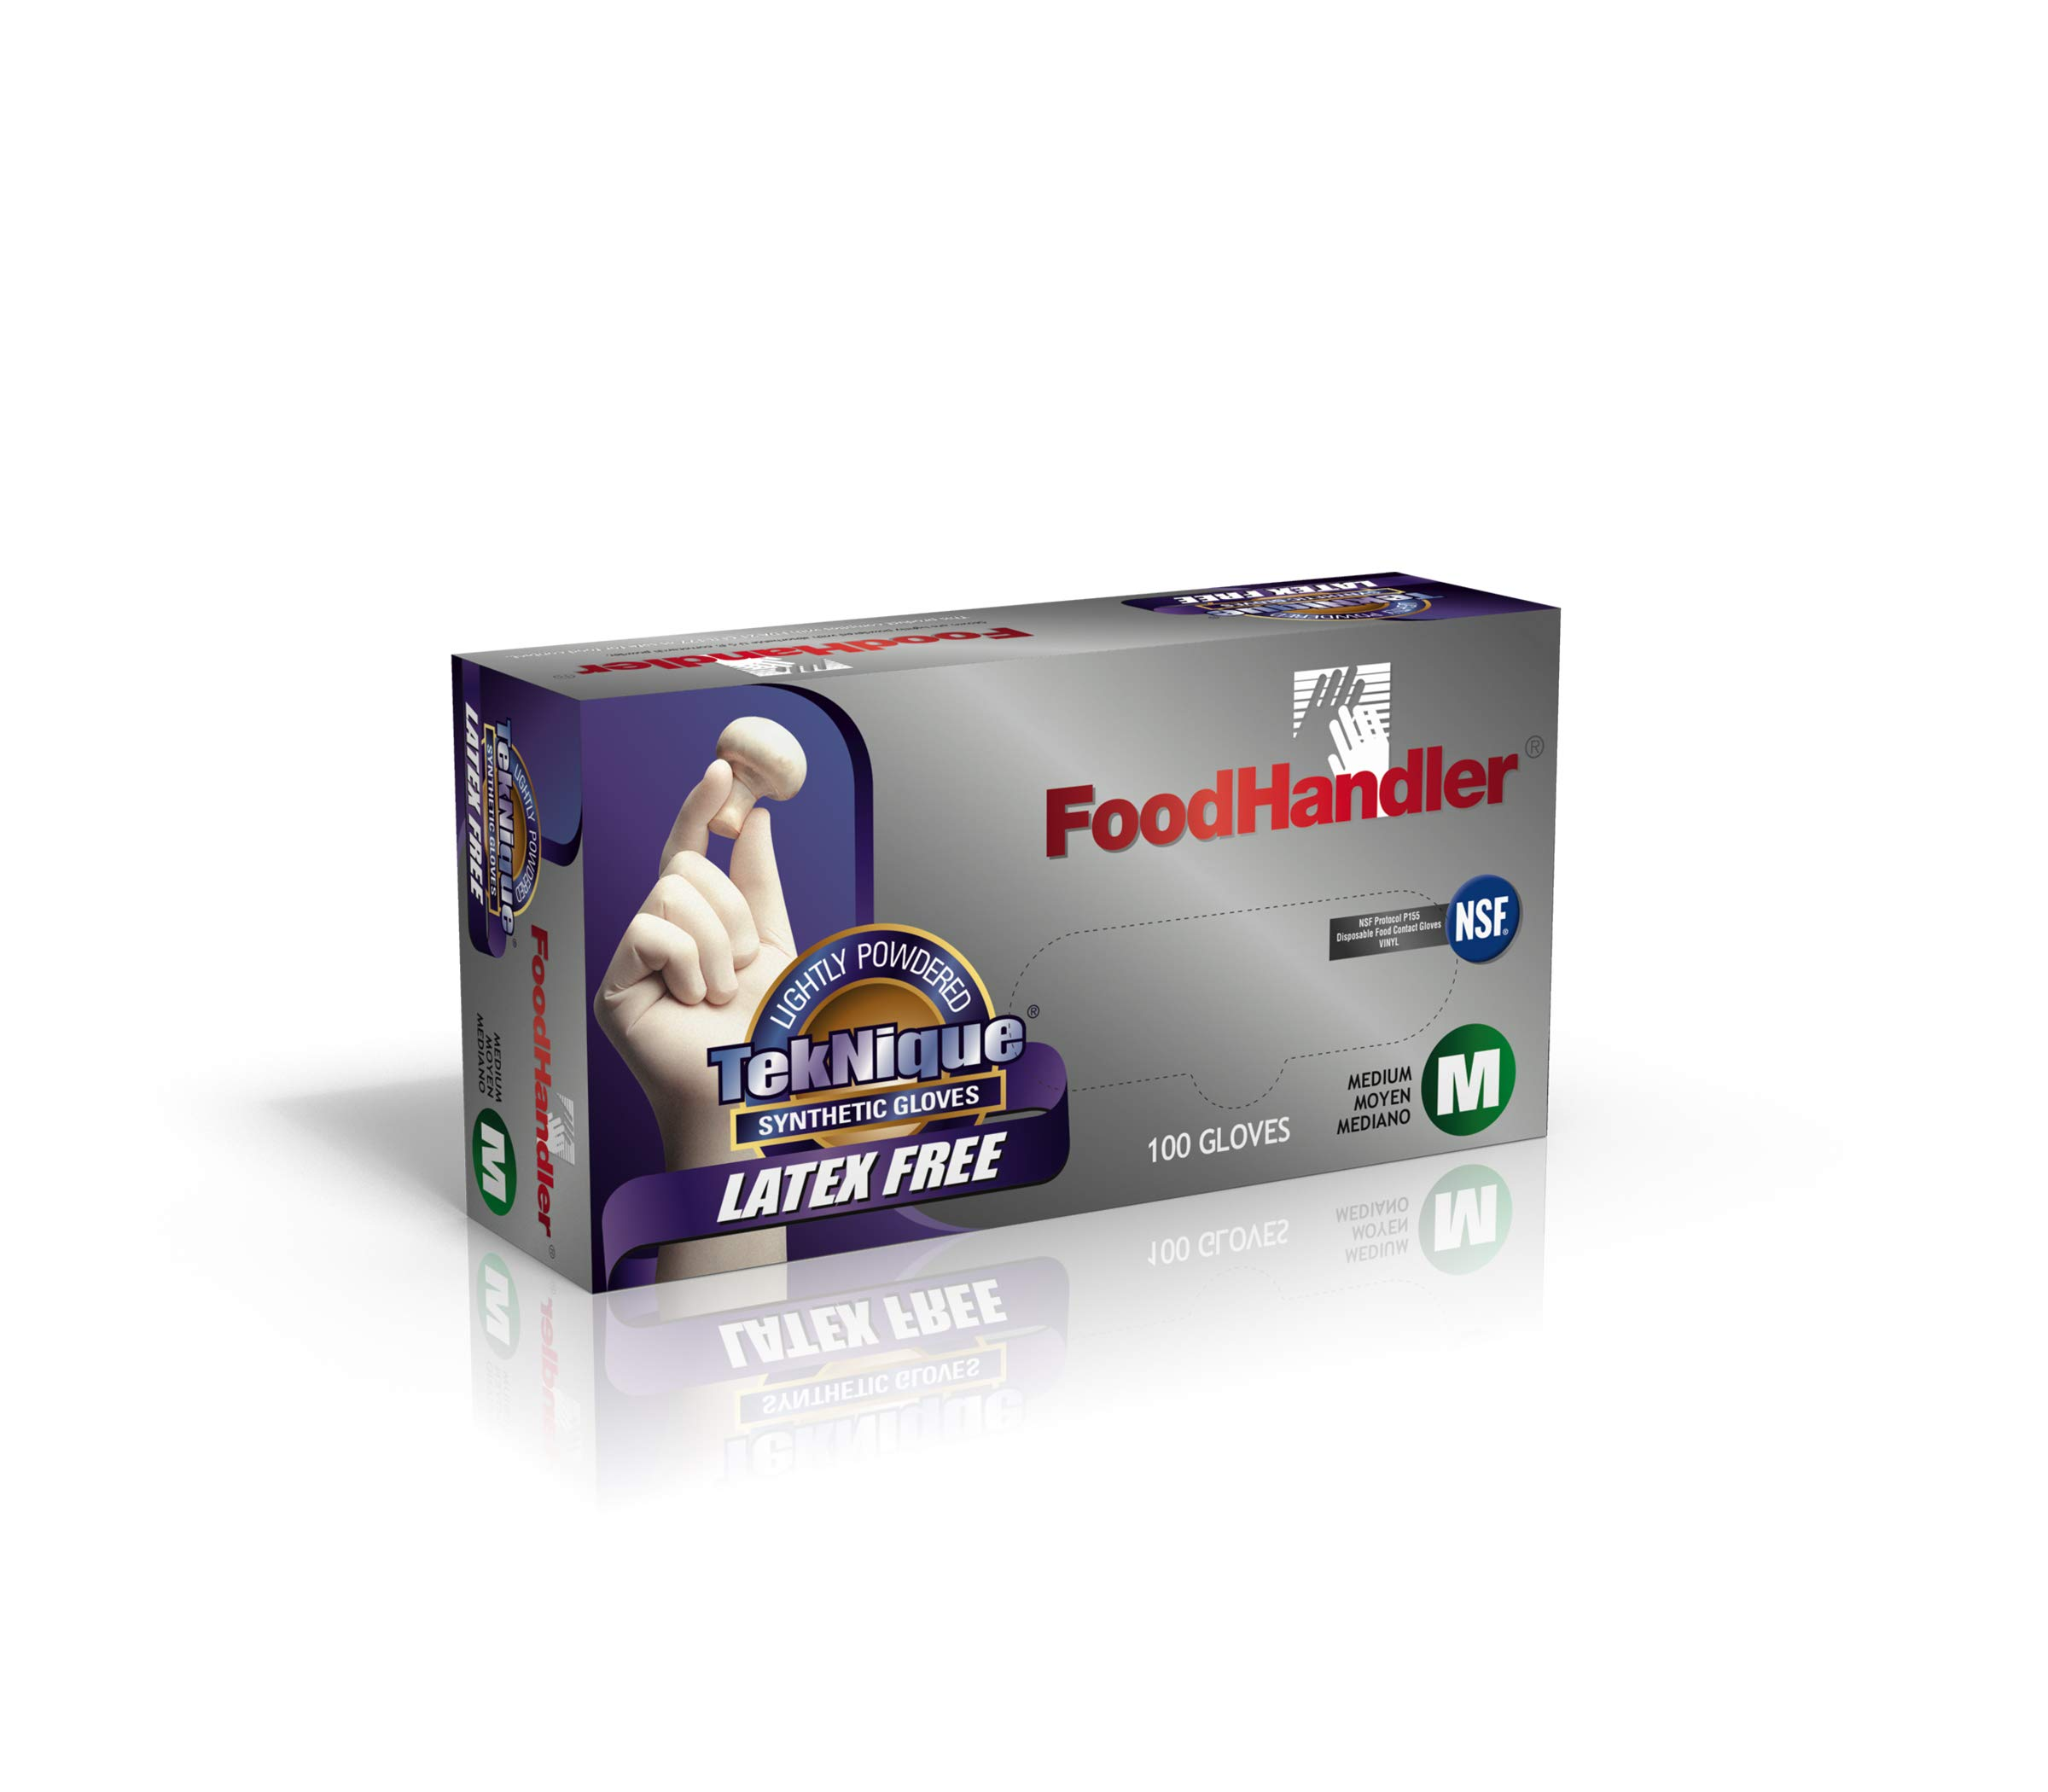 FoodHandler 103-TNQ4 FoodHandler TekNique Synthetic Vinyl MD Natural (Pack of 400)